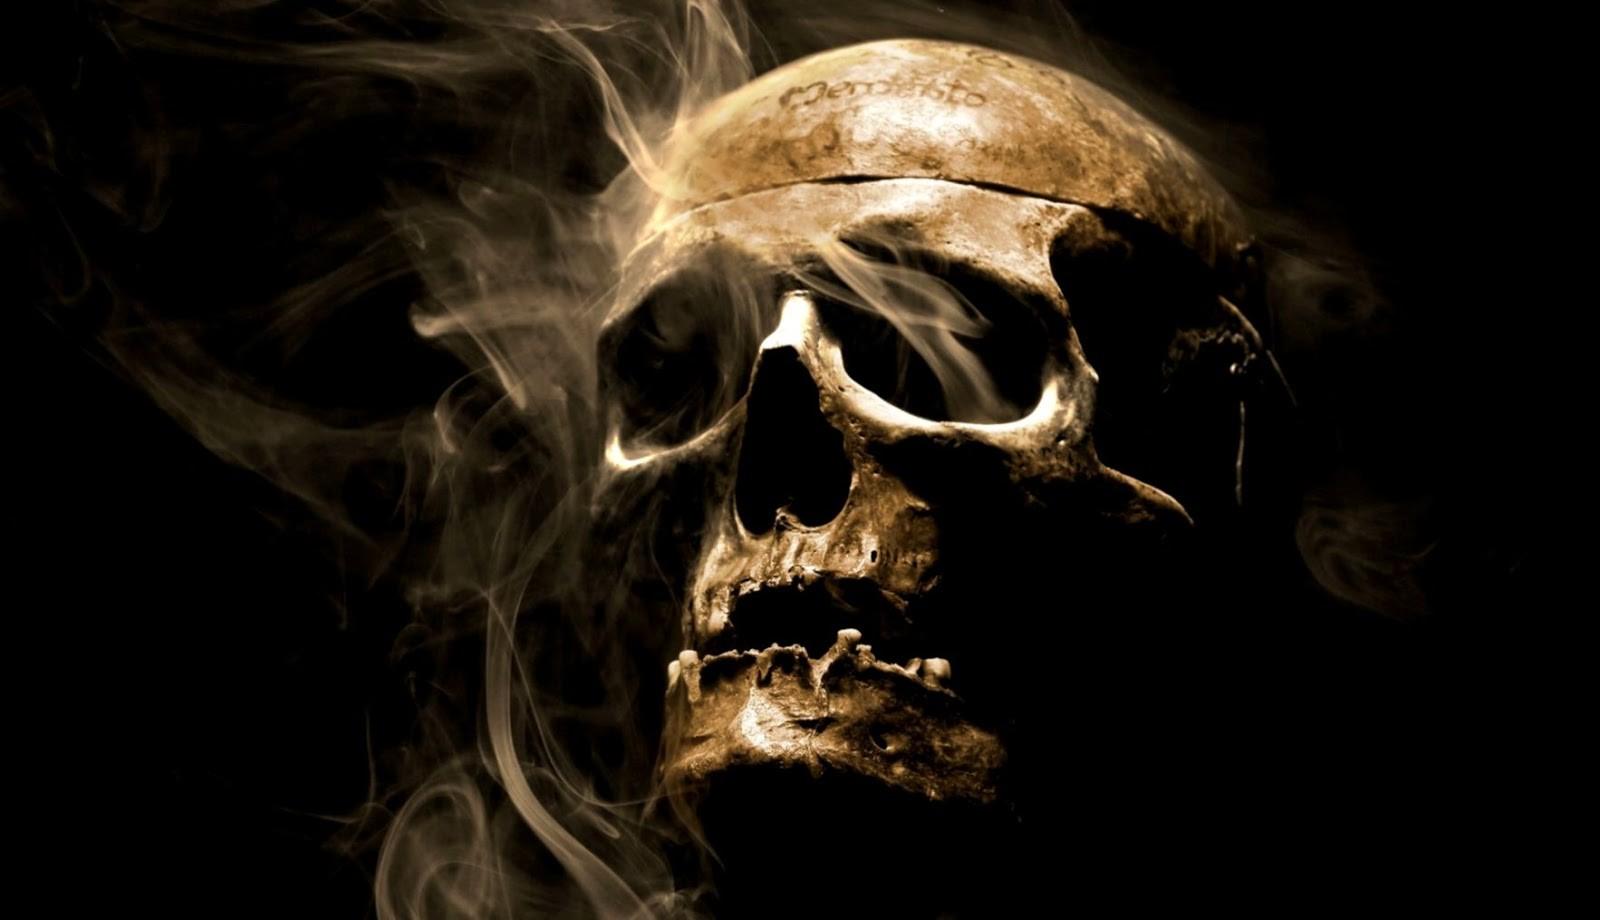 Smoke Skull Hd Artist 4k Wallpapers Images Backgrounds